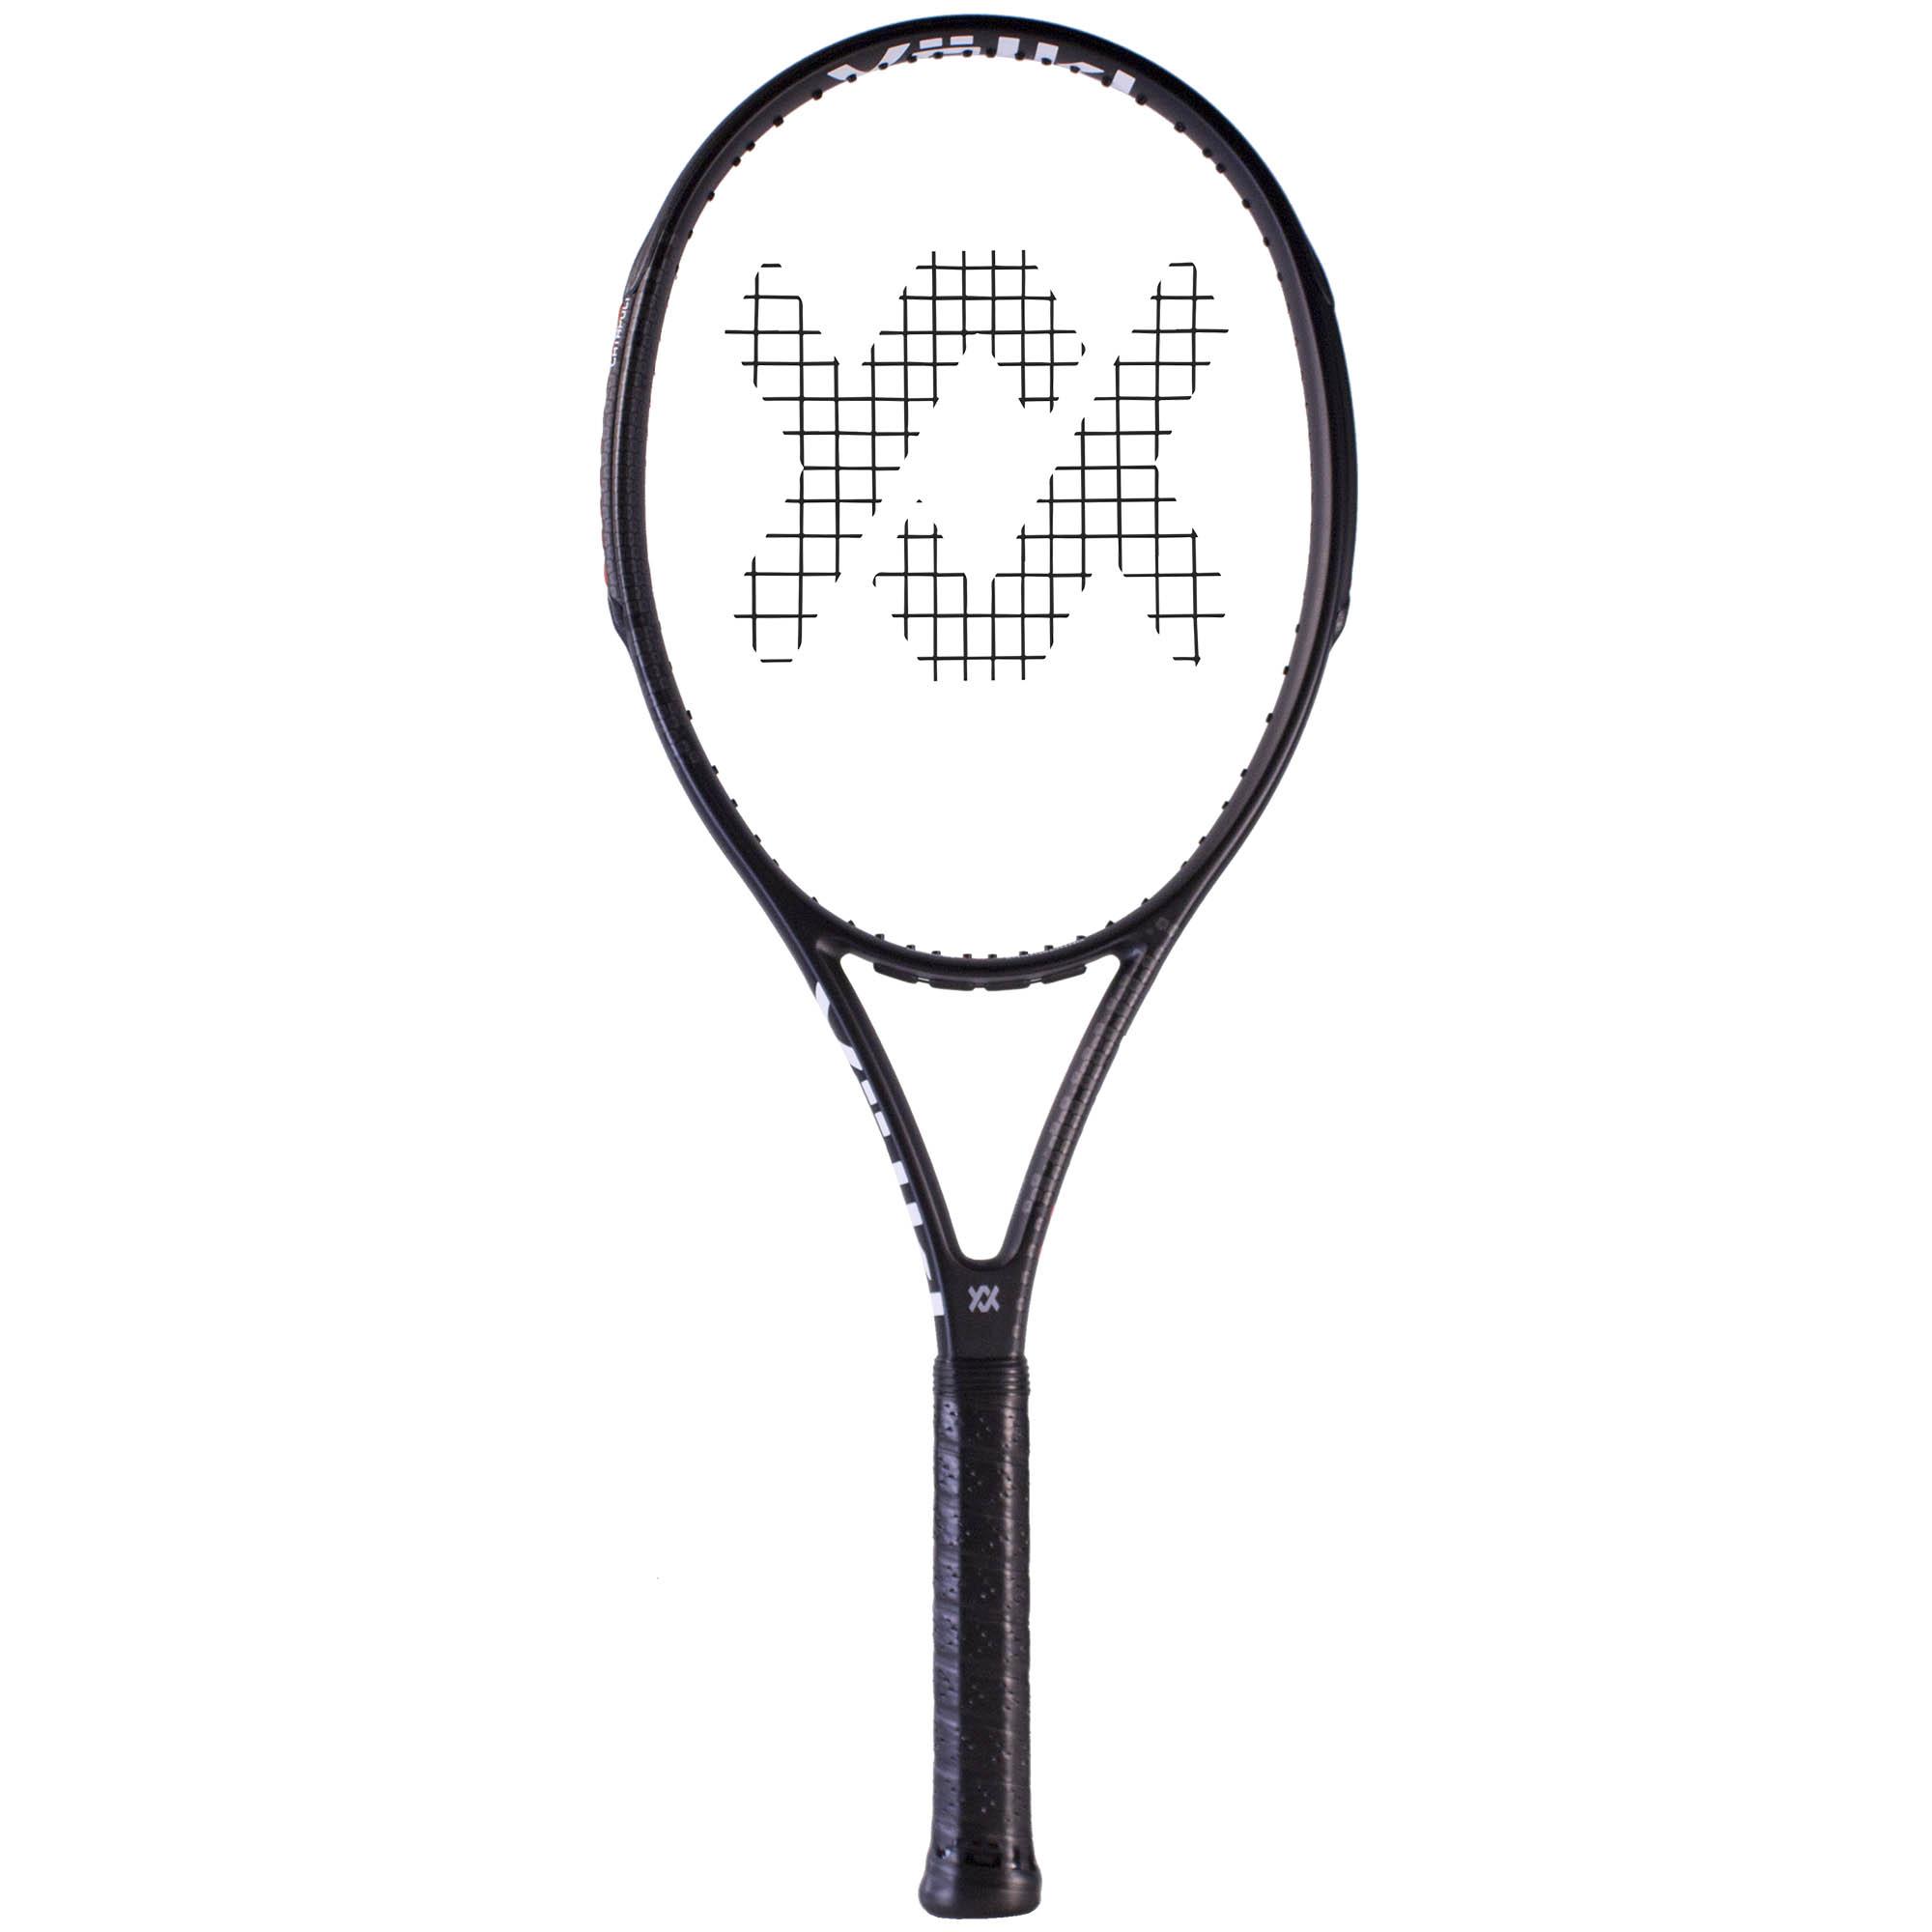 Volkl V-Feel 4 Tennis Racket - Grip 3